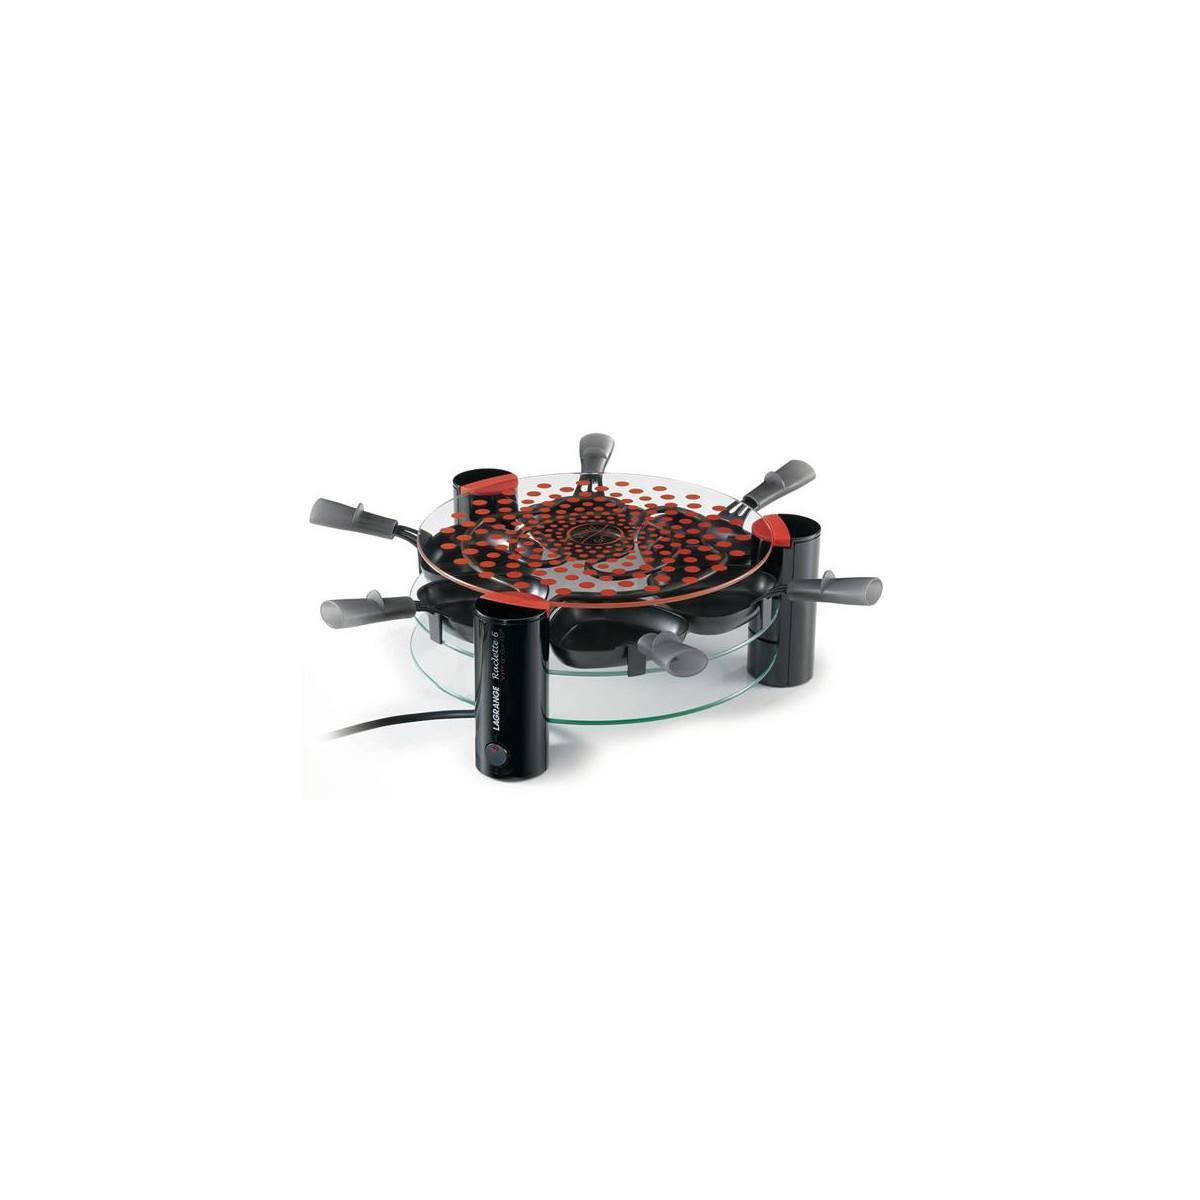 Lagrange Raclette Vitro Grill 6 Pers Lagrange - 009631